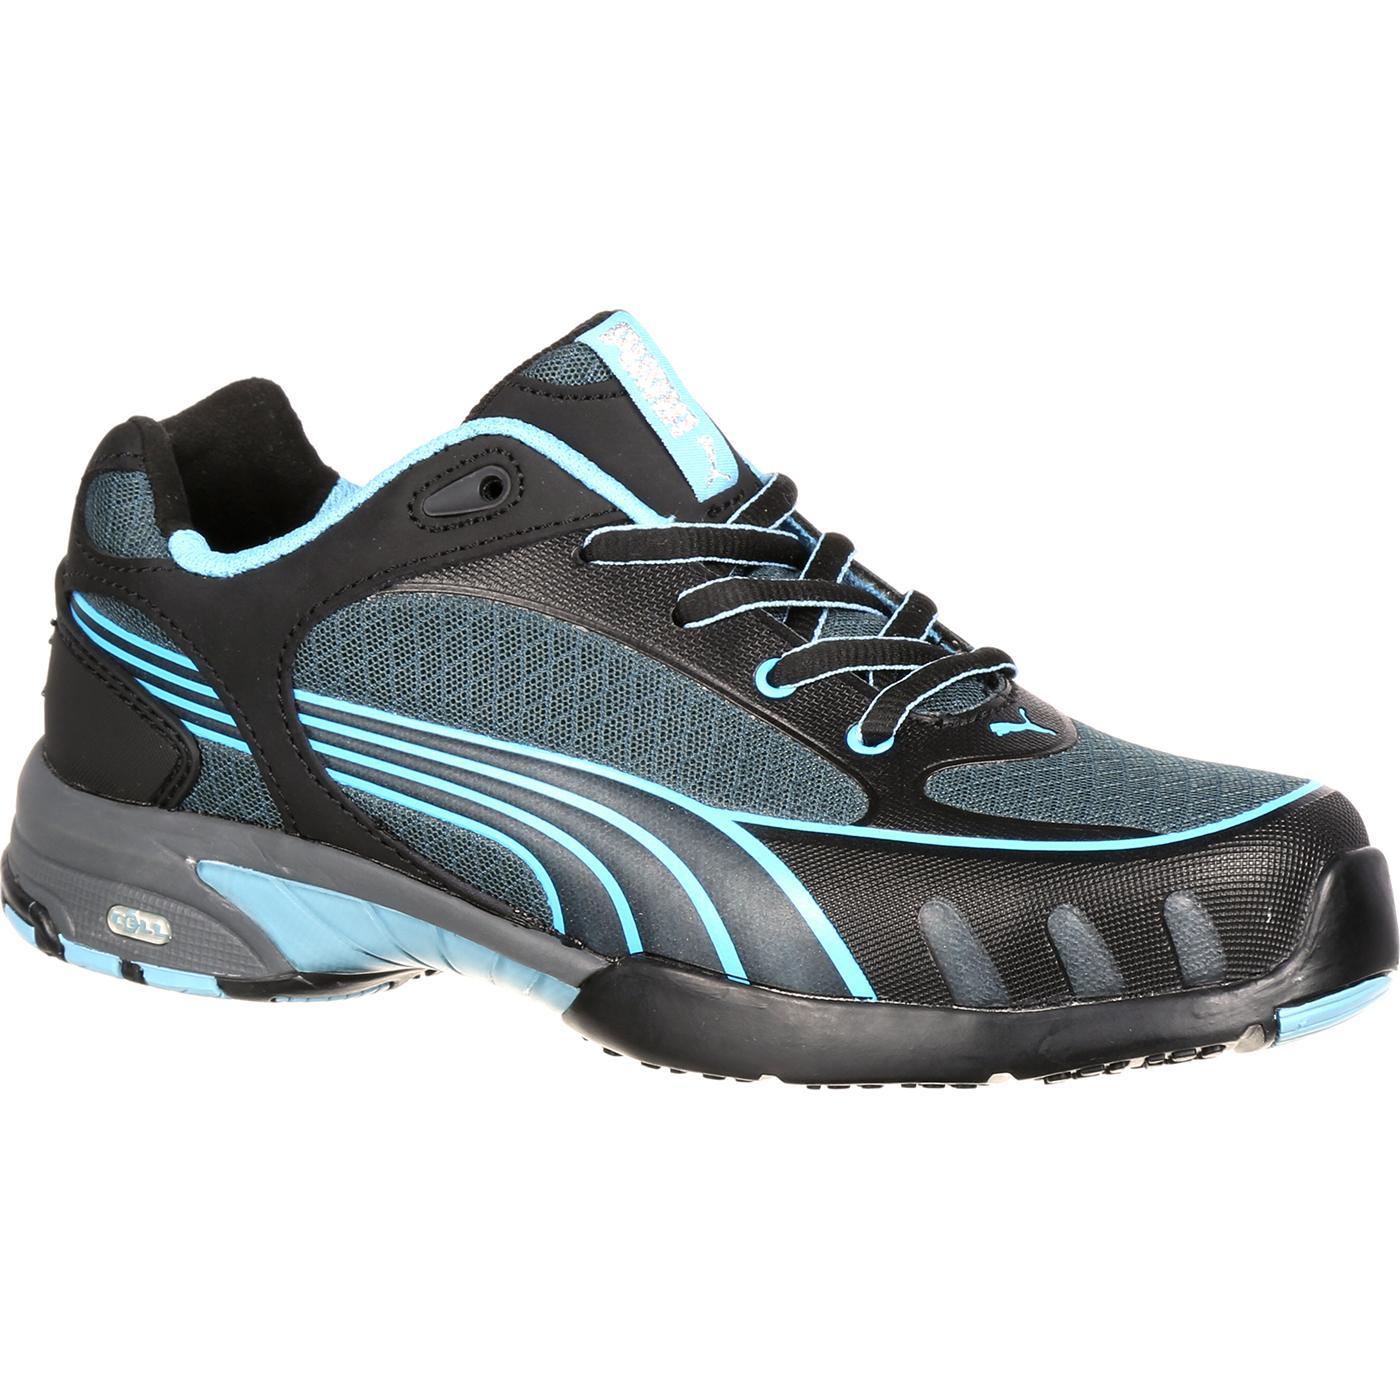 steel toe shoes for women puma fuse motion womenu0027s steel toe static-dissipative work athletic shoe, ,  large rixzxie